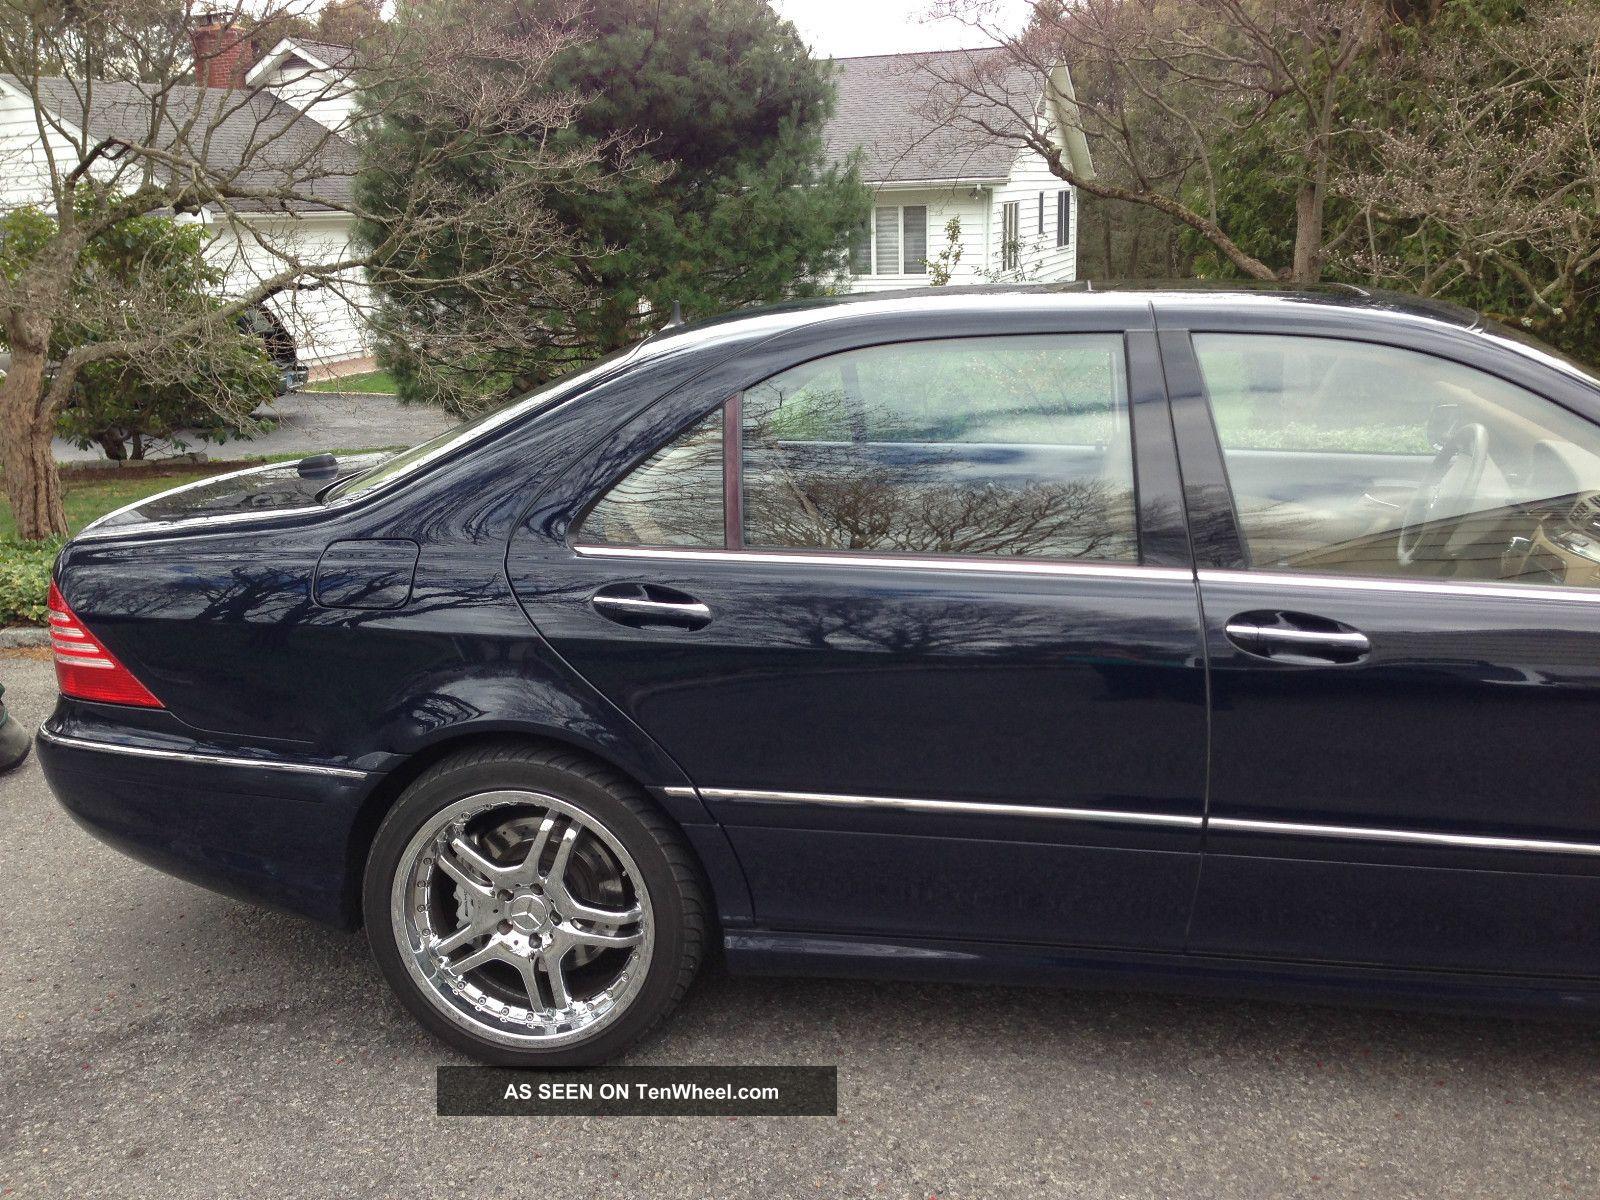 2006 mercedes benz s55 amg base sedan 4 door 5 5l loaded for Mercedes benz s55